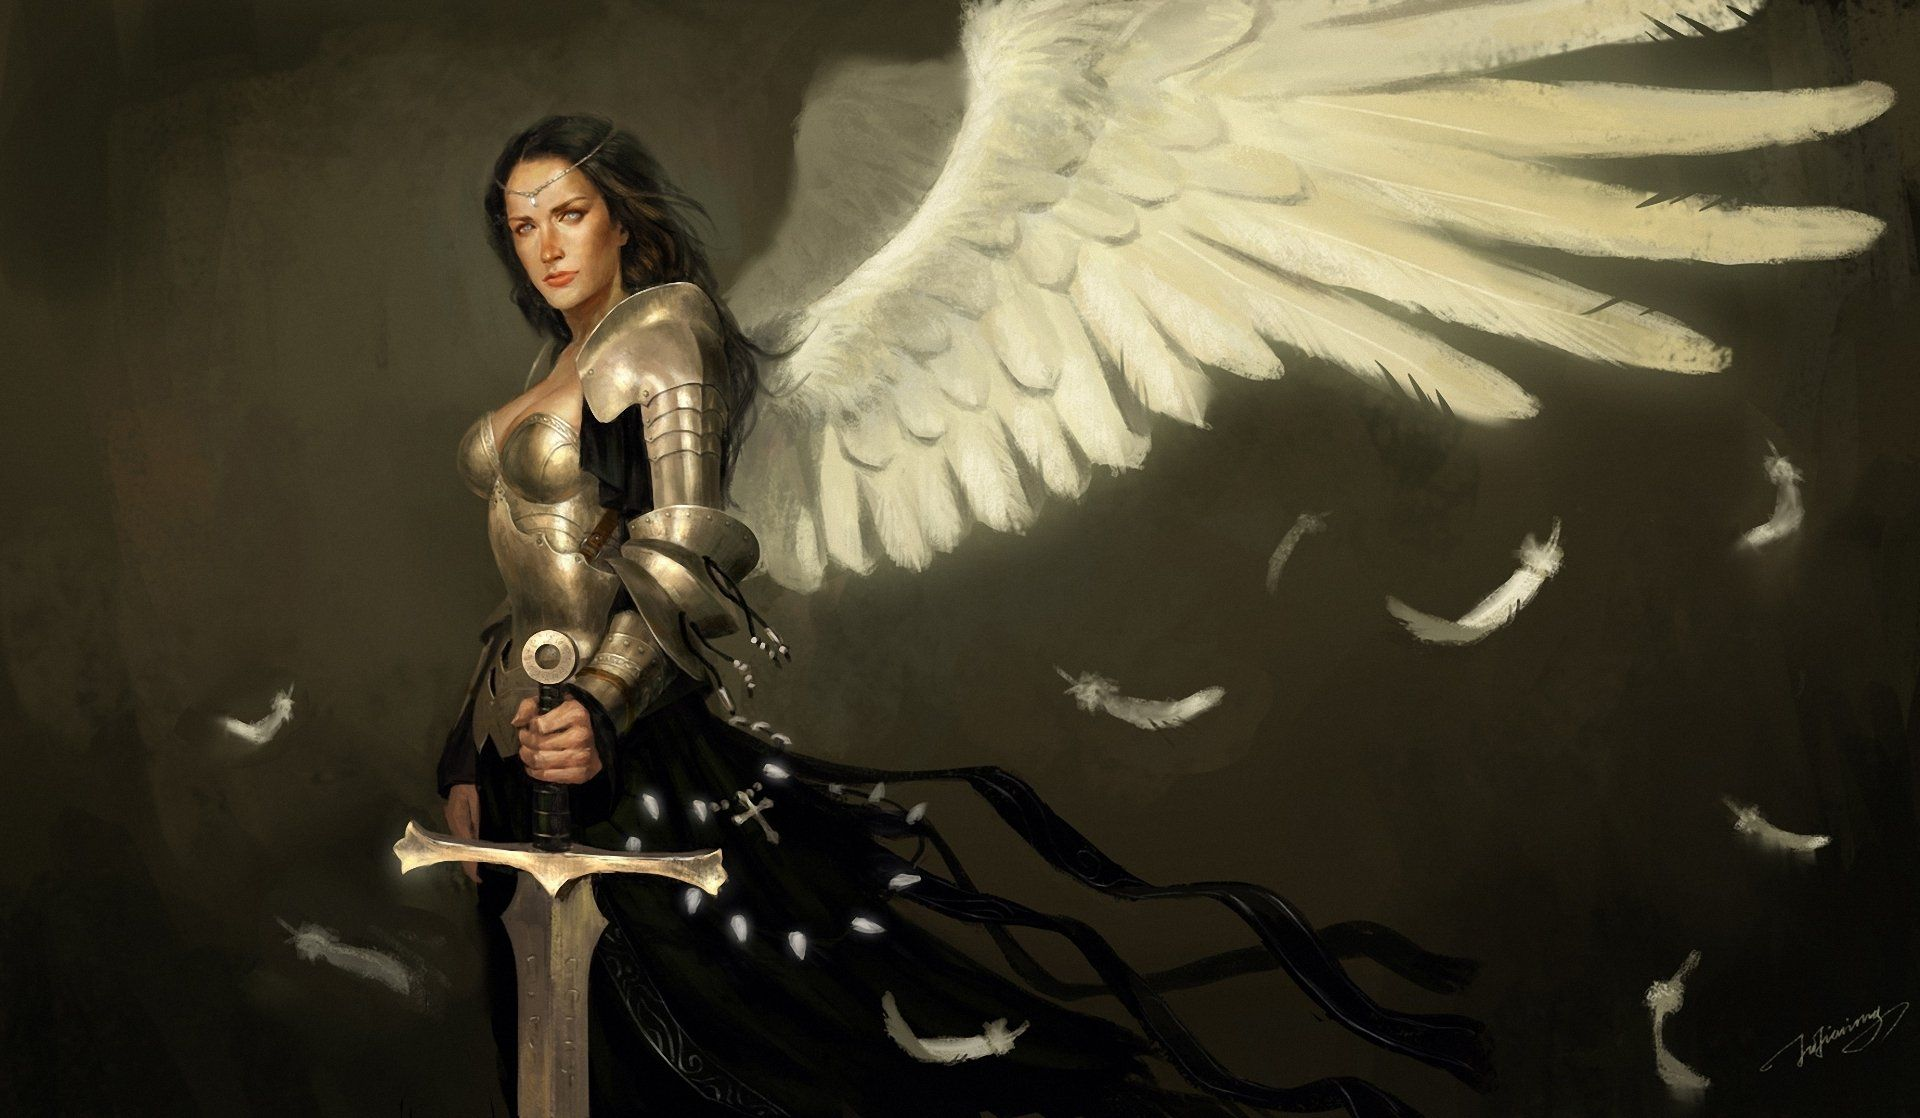 angel warrior sword wings - photo #5